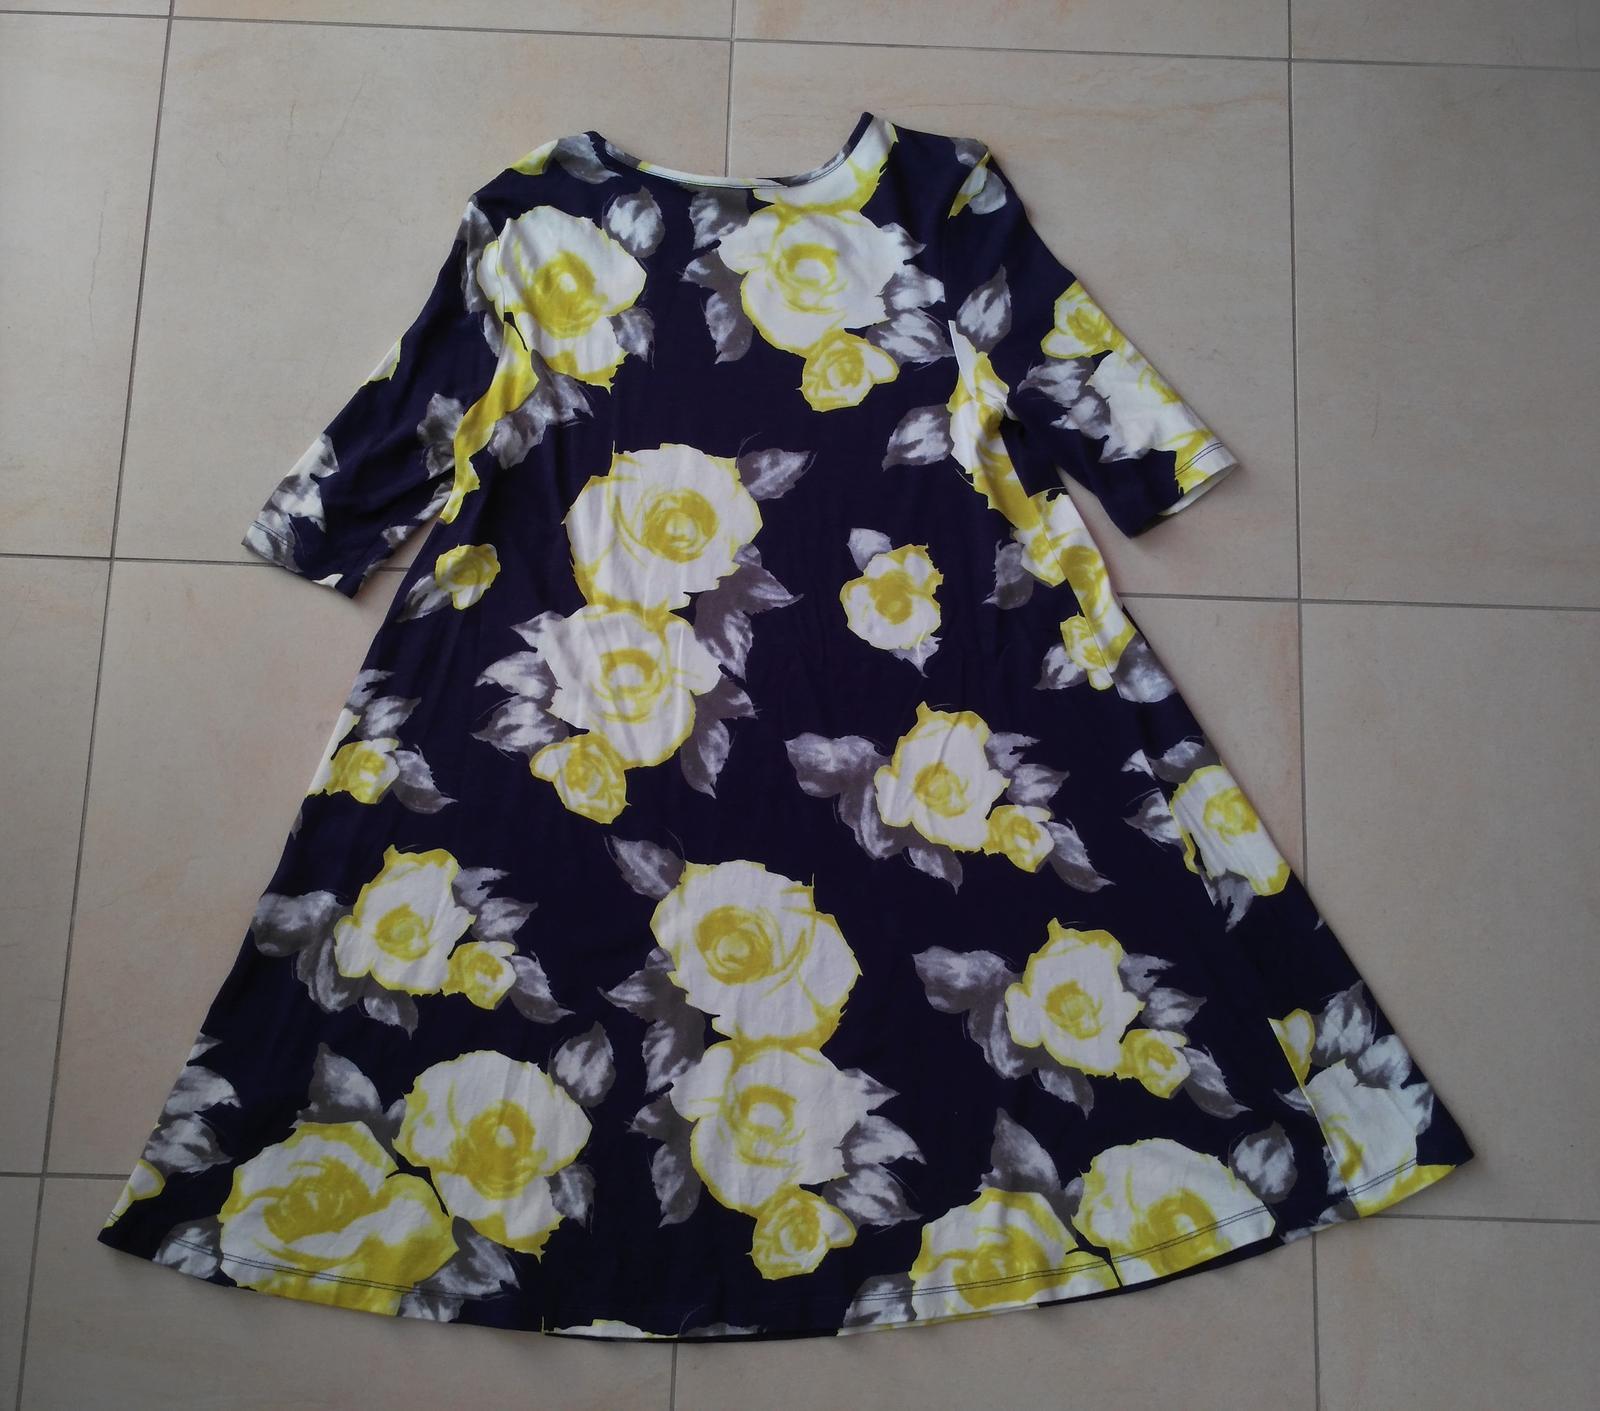 Tmavomodré kvetované šaty 40(l) d93d20835bd